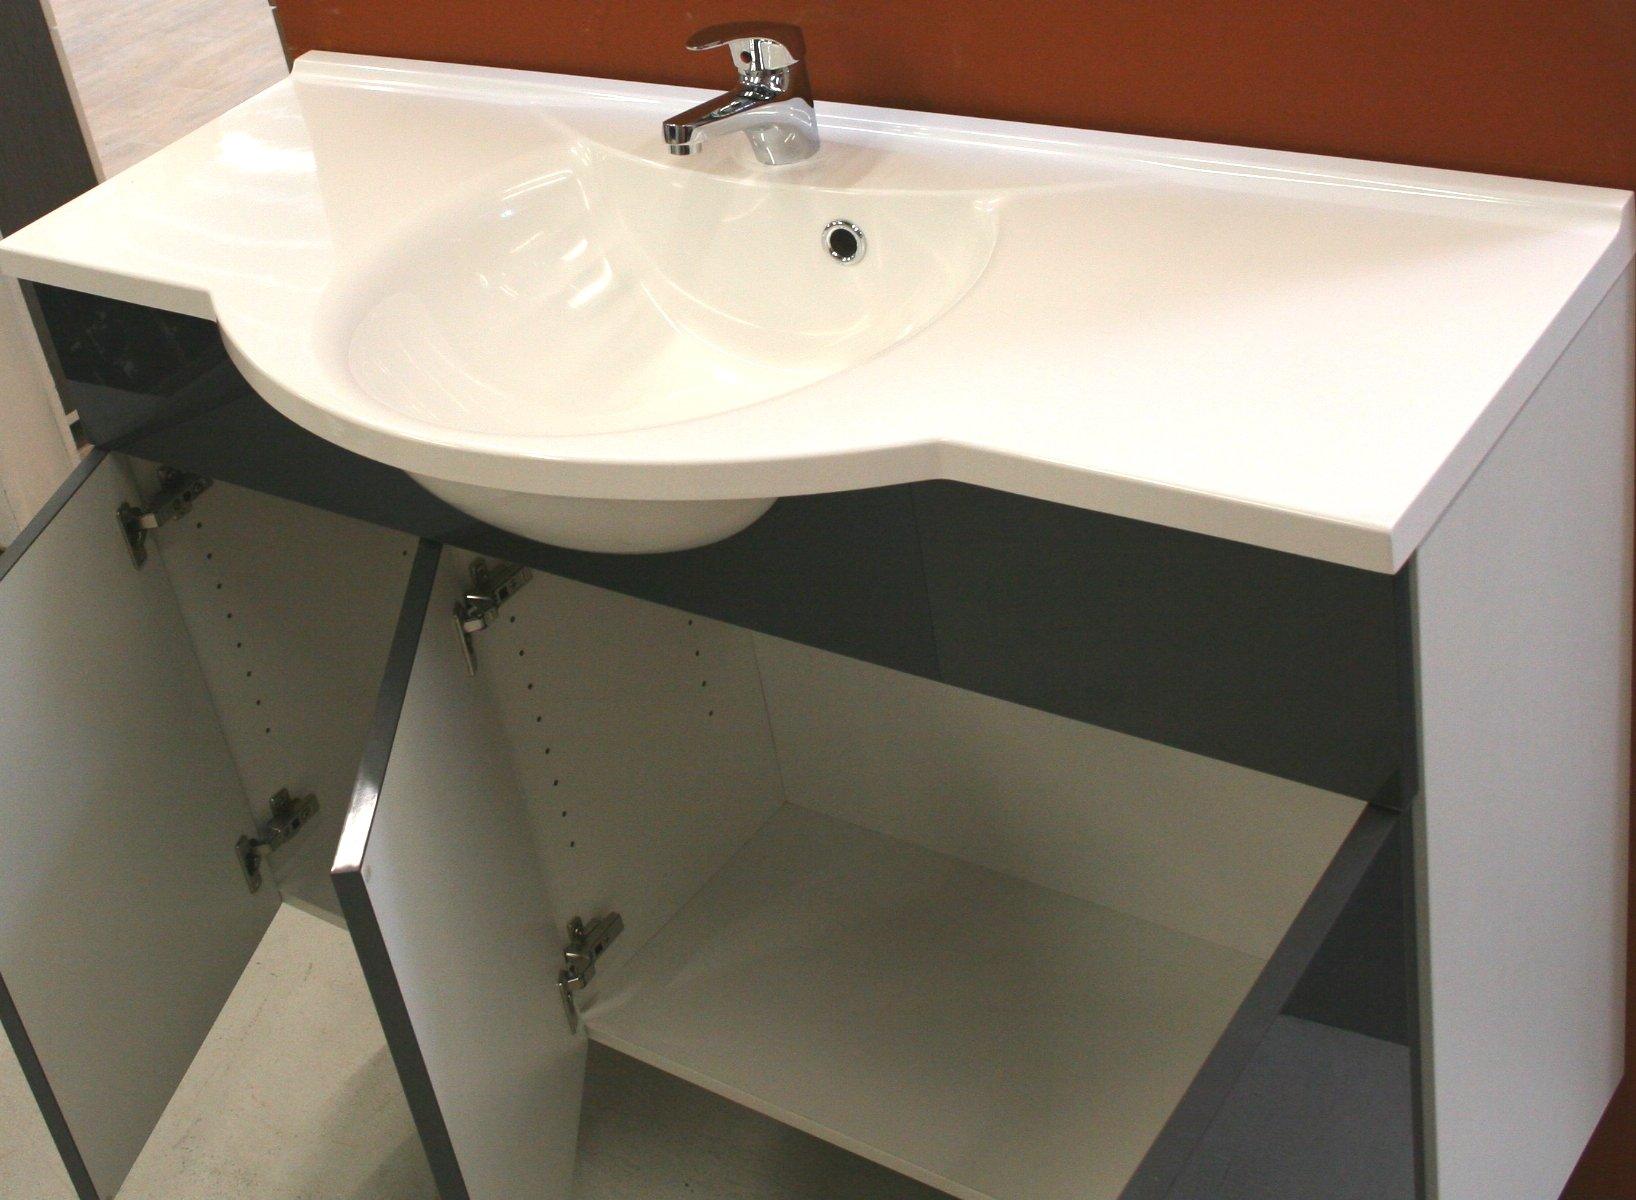 musterbad sischo trend waschtischunterschrank anthrazit gl nz incl waschtisch ebay. Black Bedroom Furniture Sets. Home Design Ideas